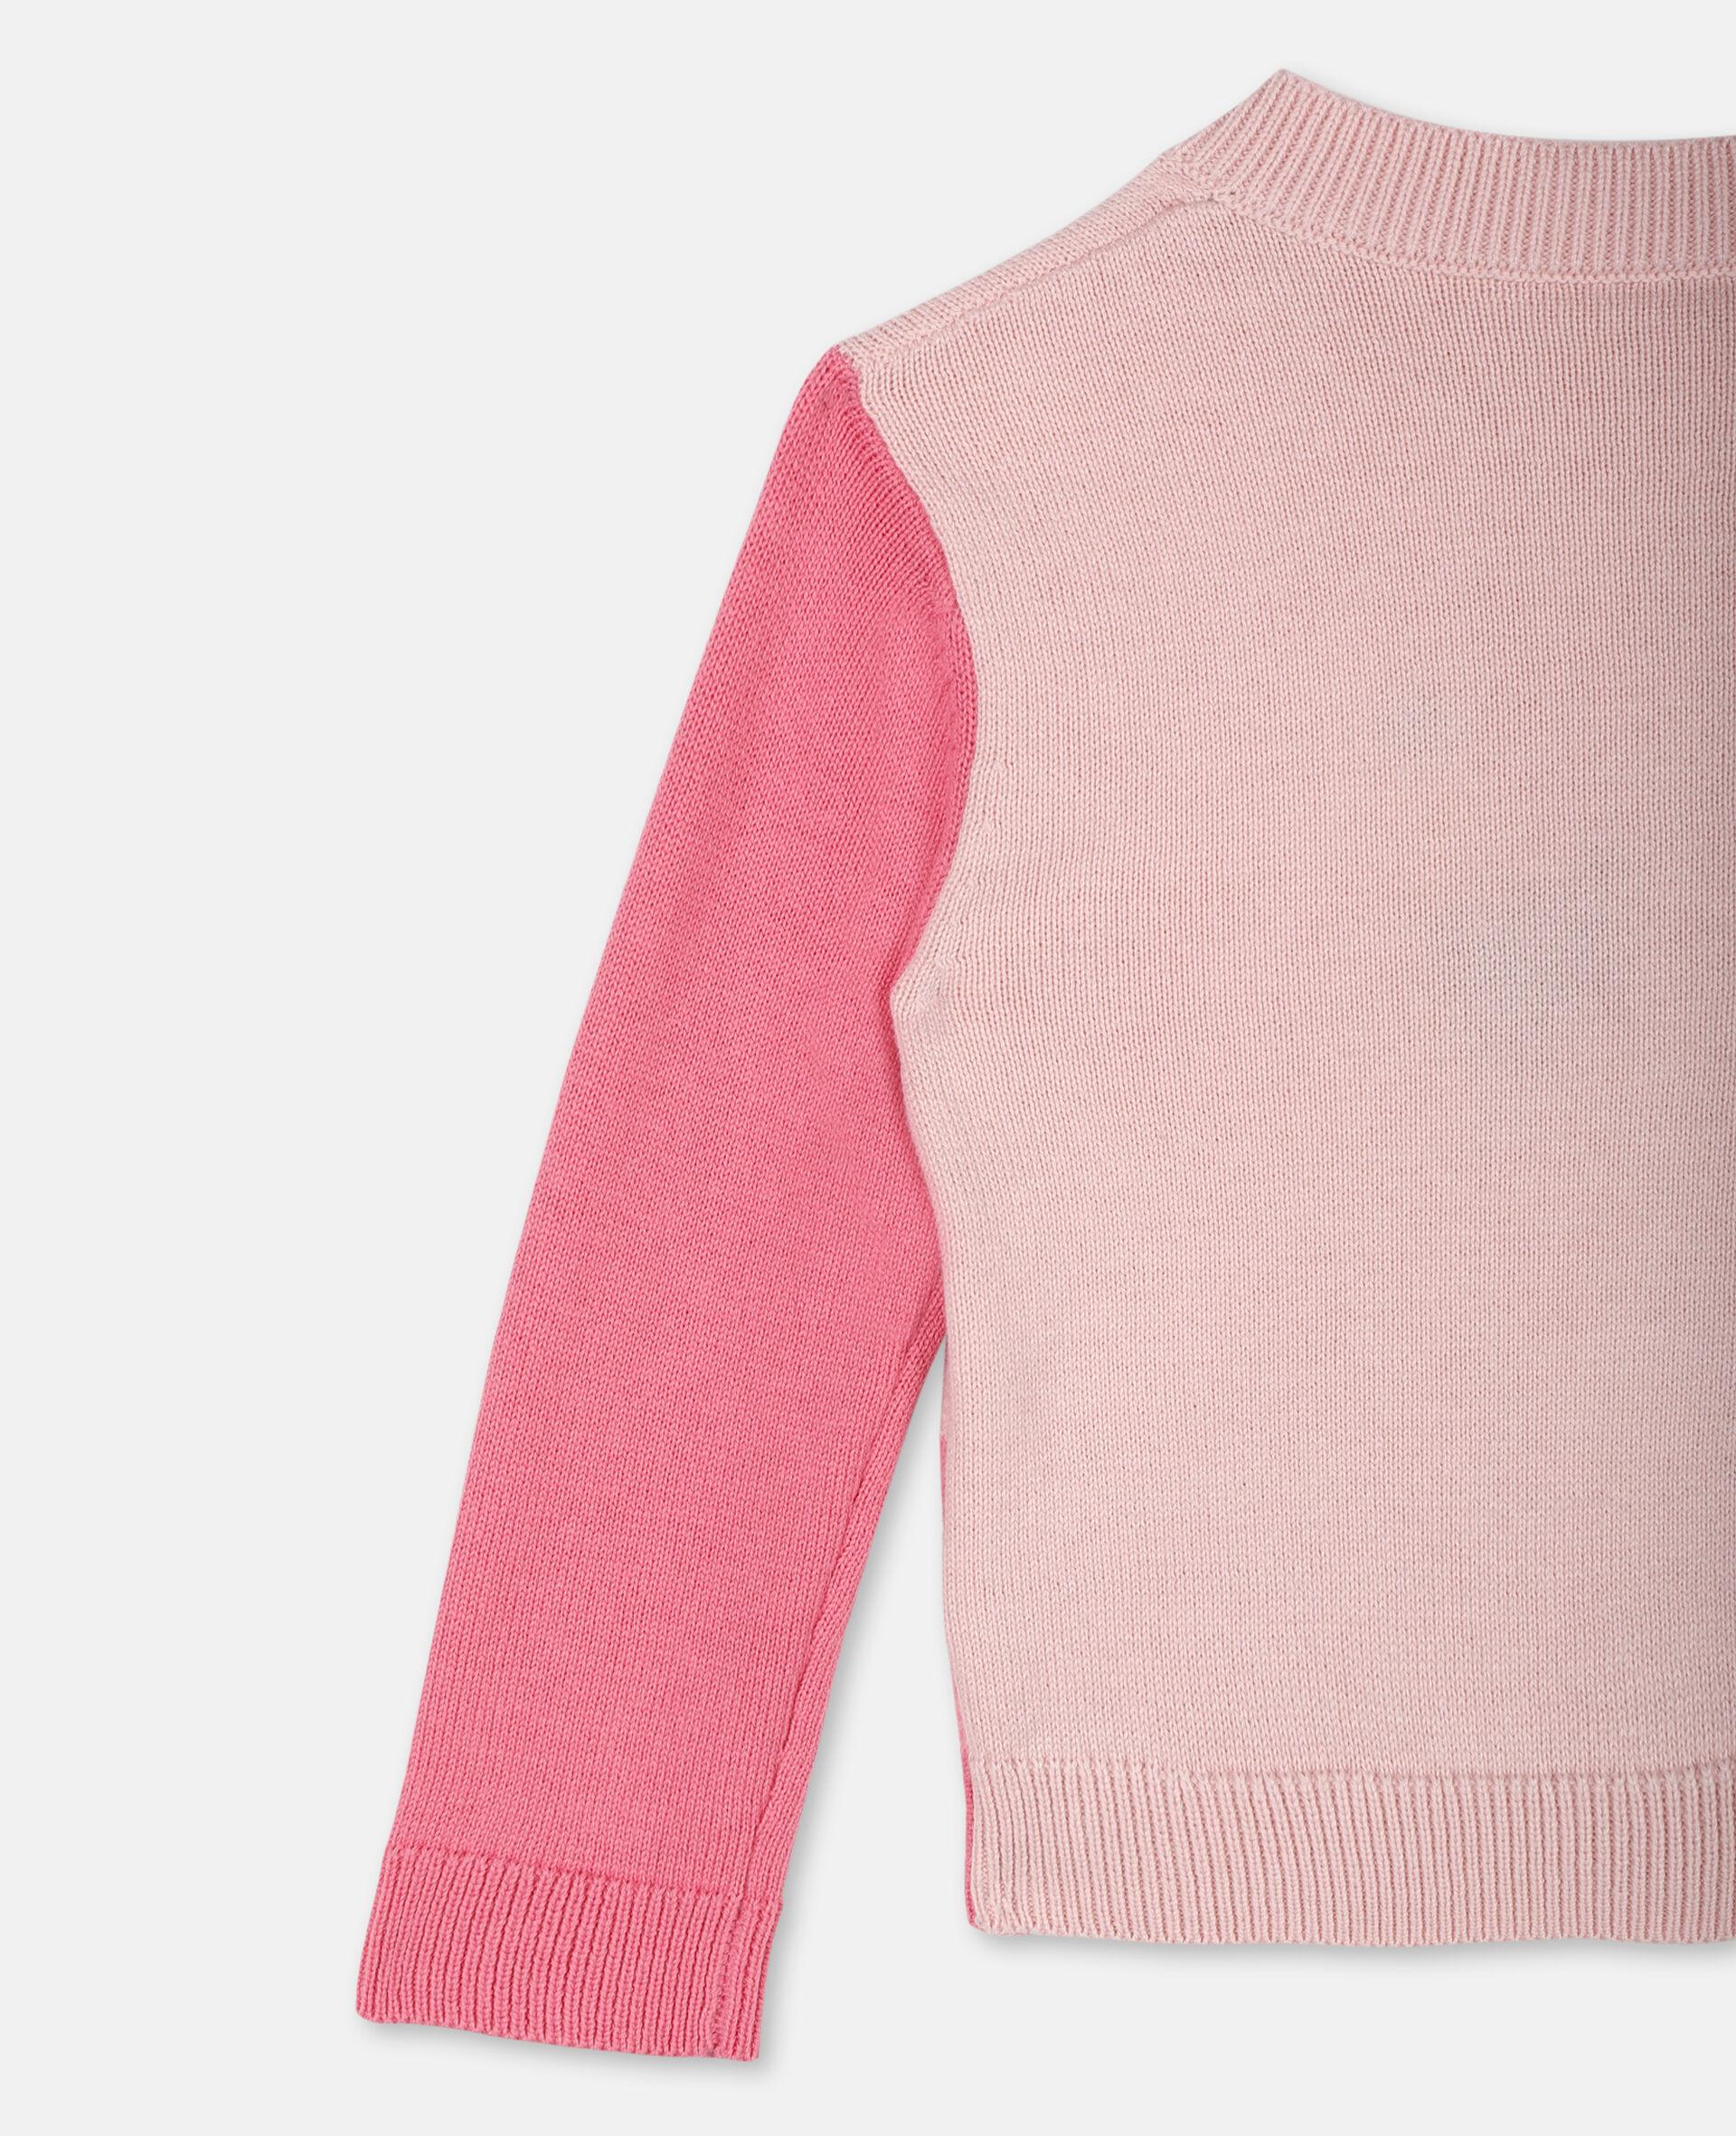 Cardigan en coton avec intarsia flamant rose -Rose-large image number 2